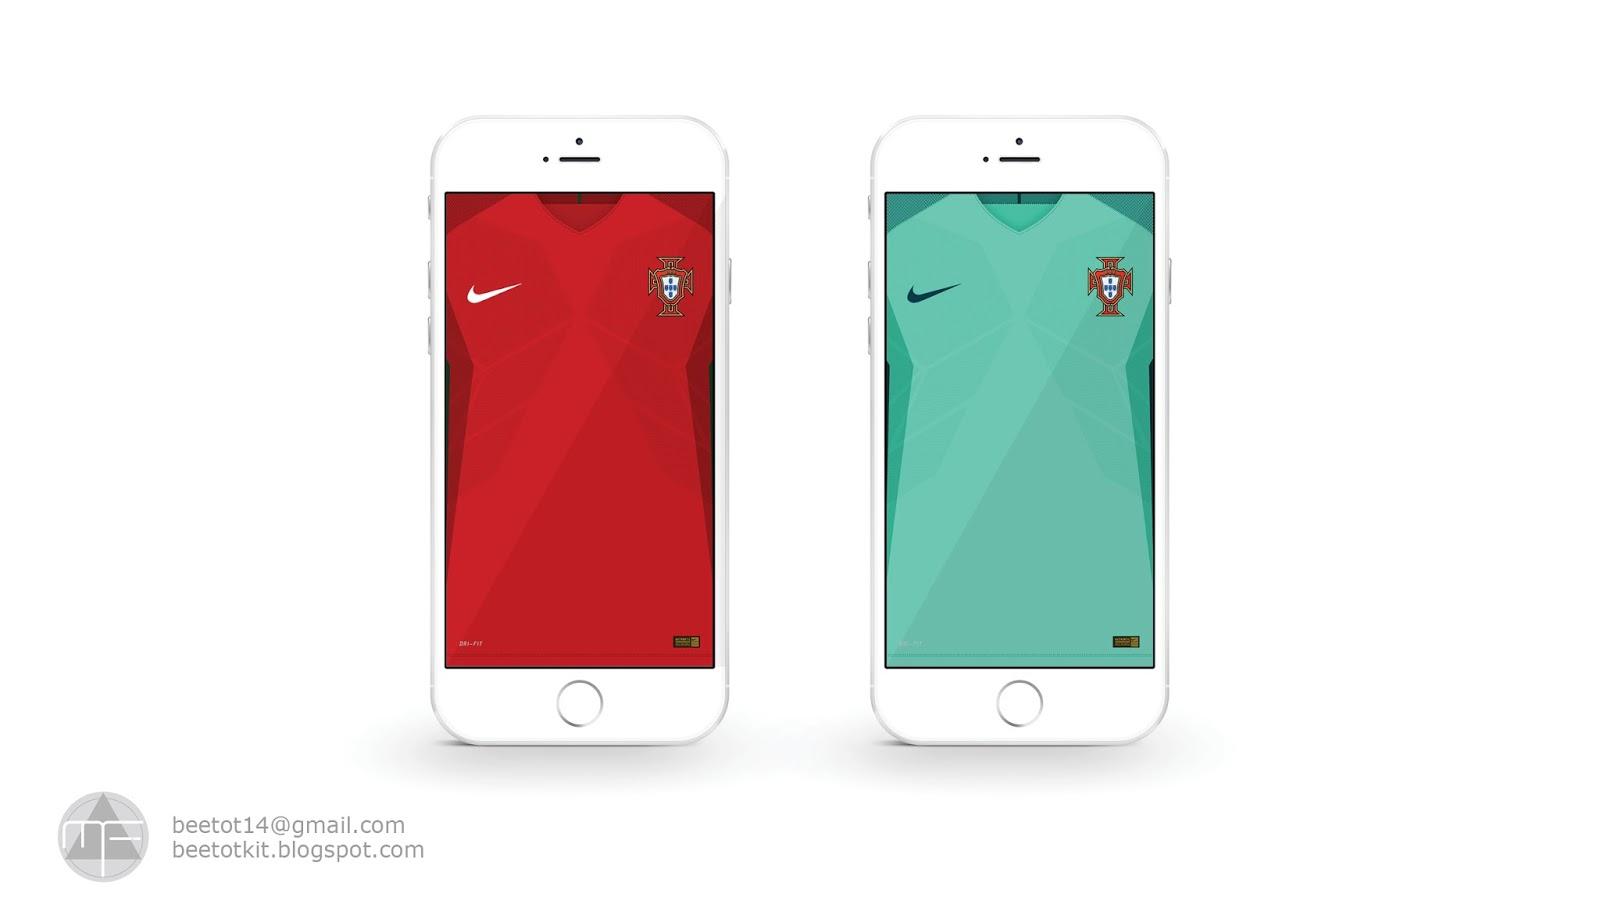 beetot kit portugal kit euro 2016 iphone 6 wallpaper